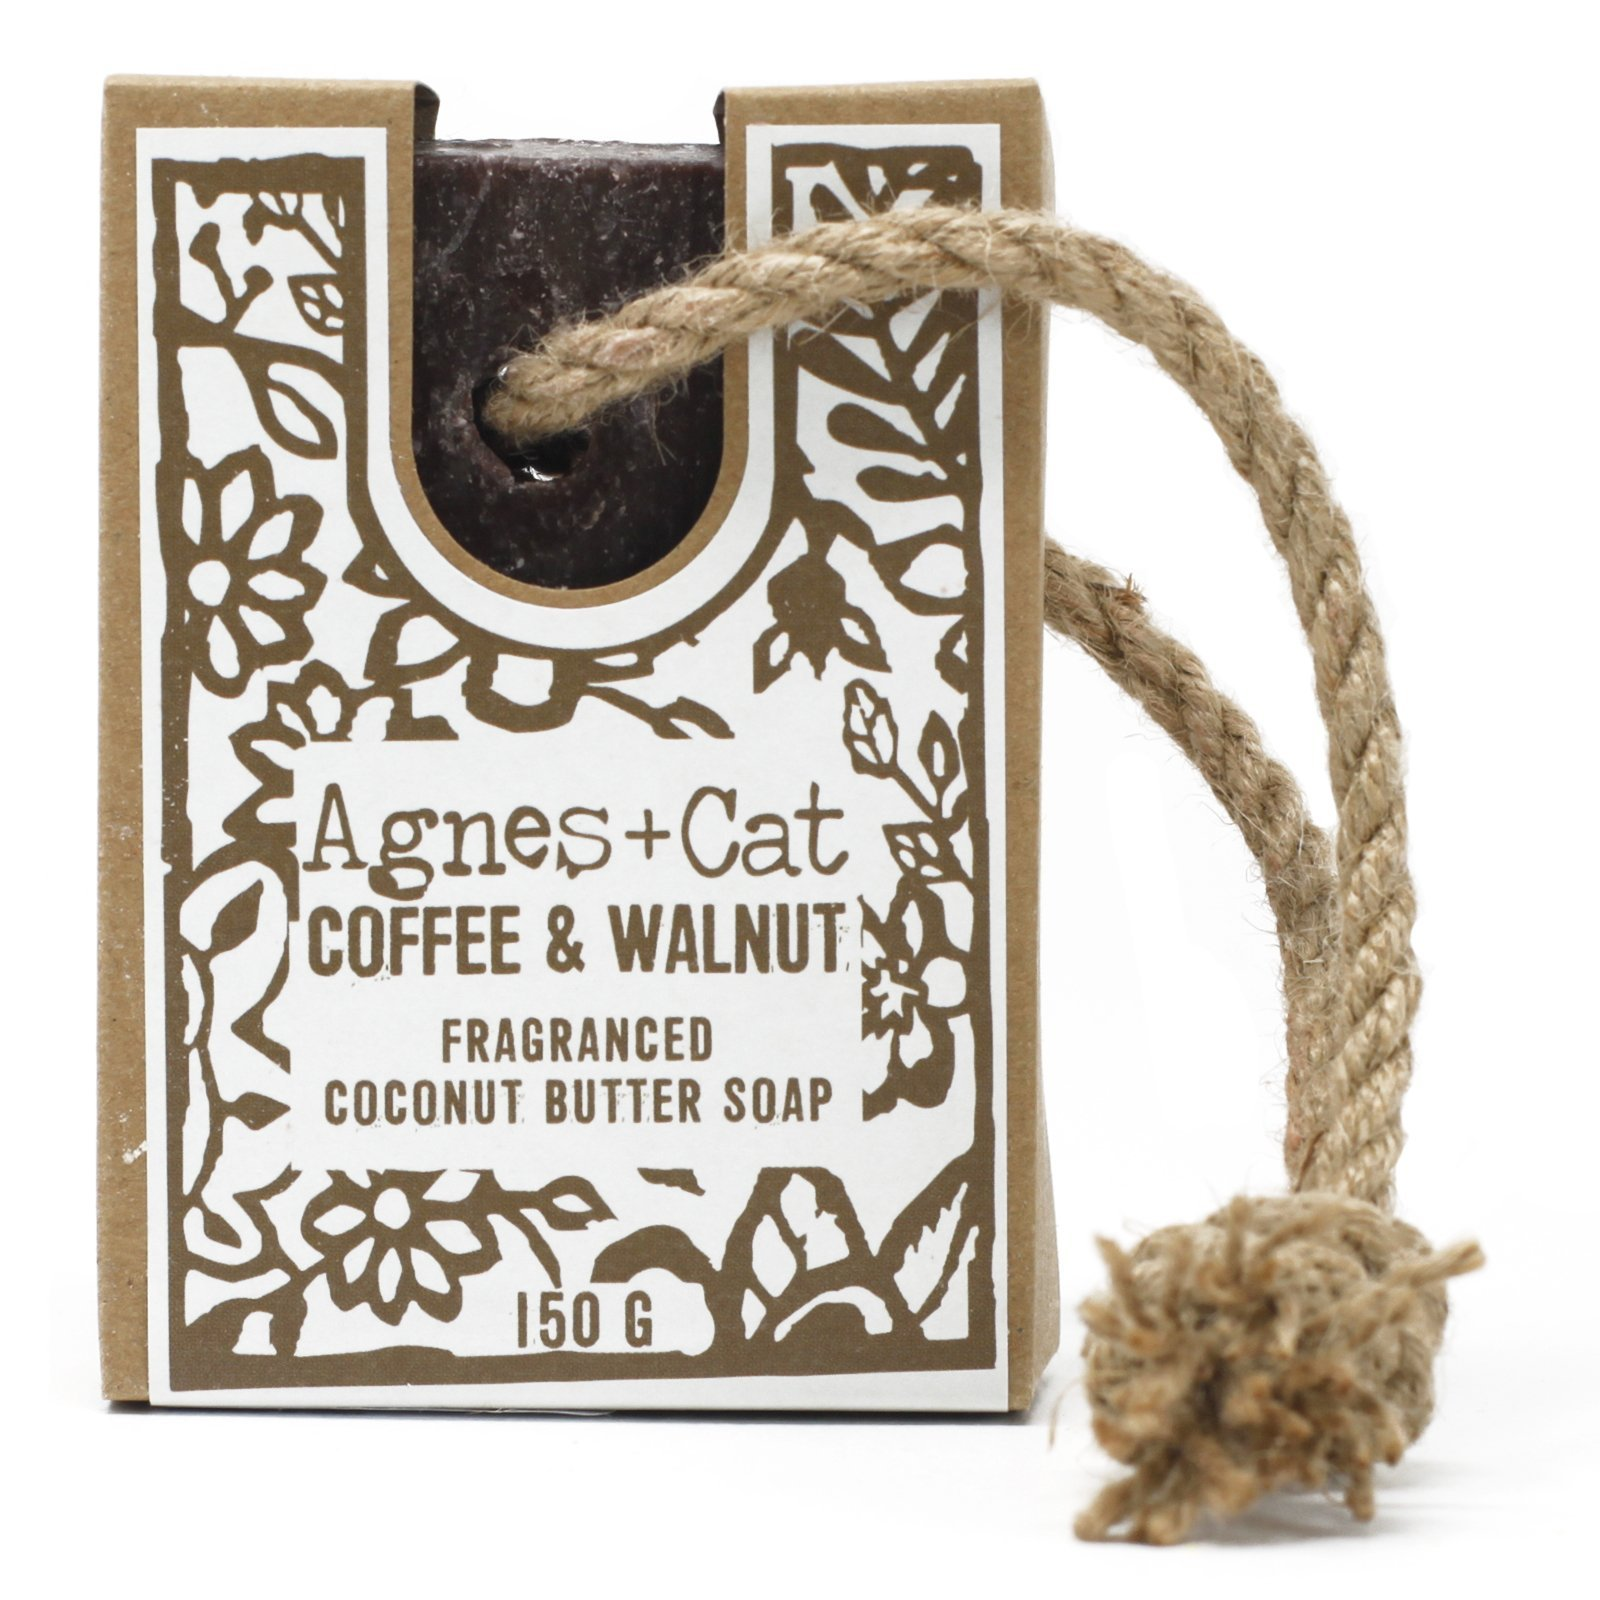 Coffee & Walnut Soap on a Rope